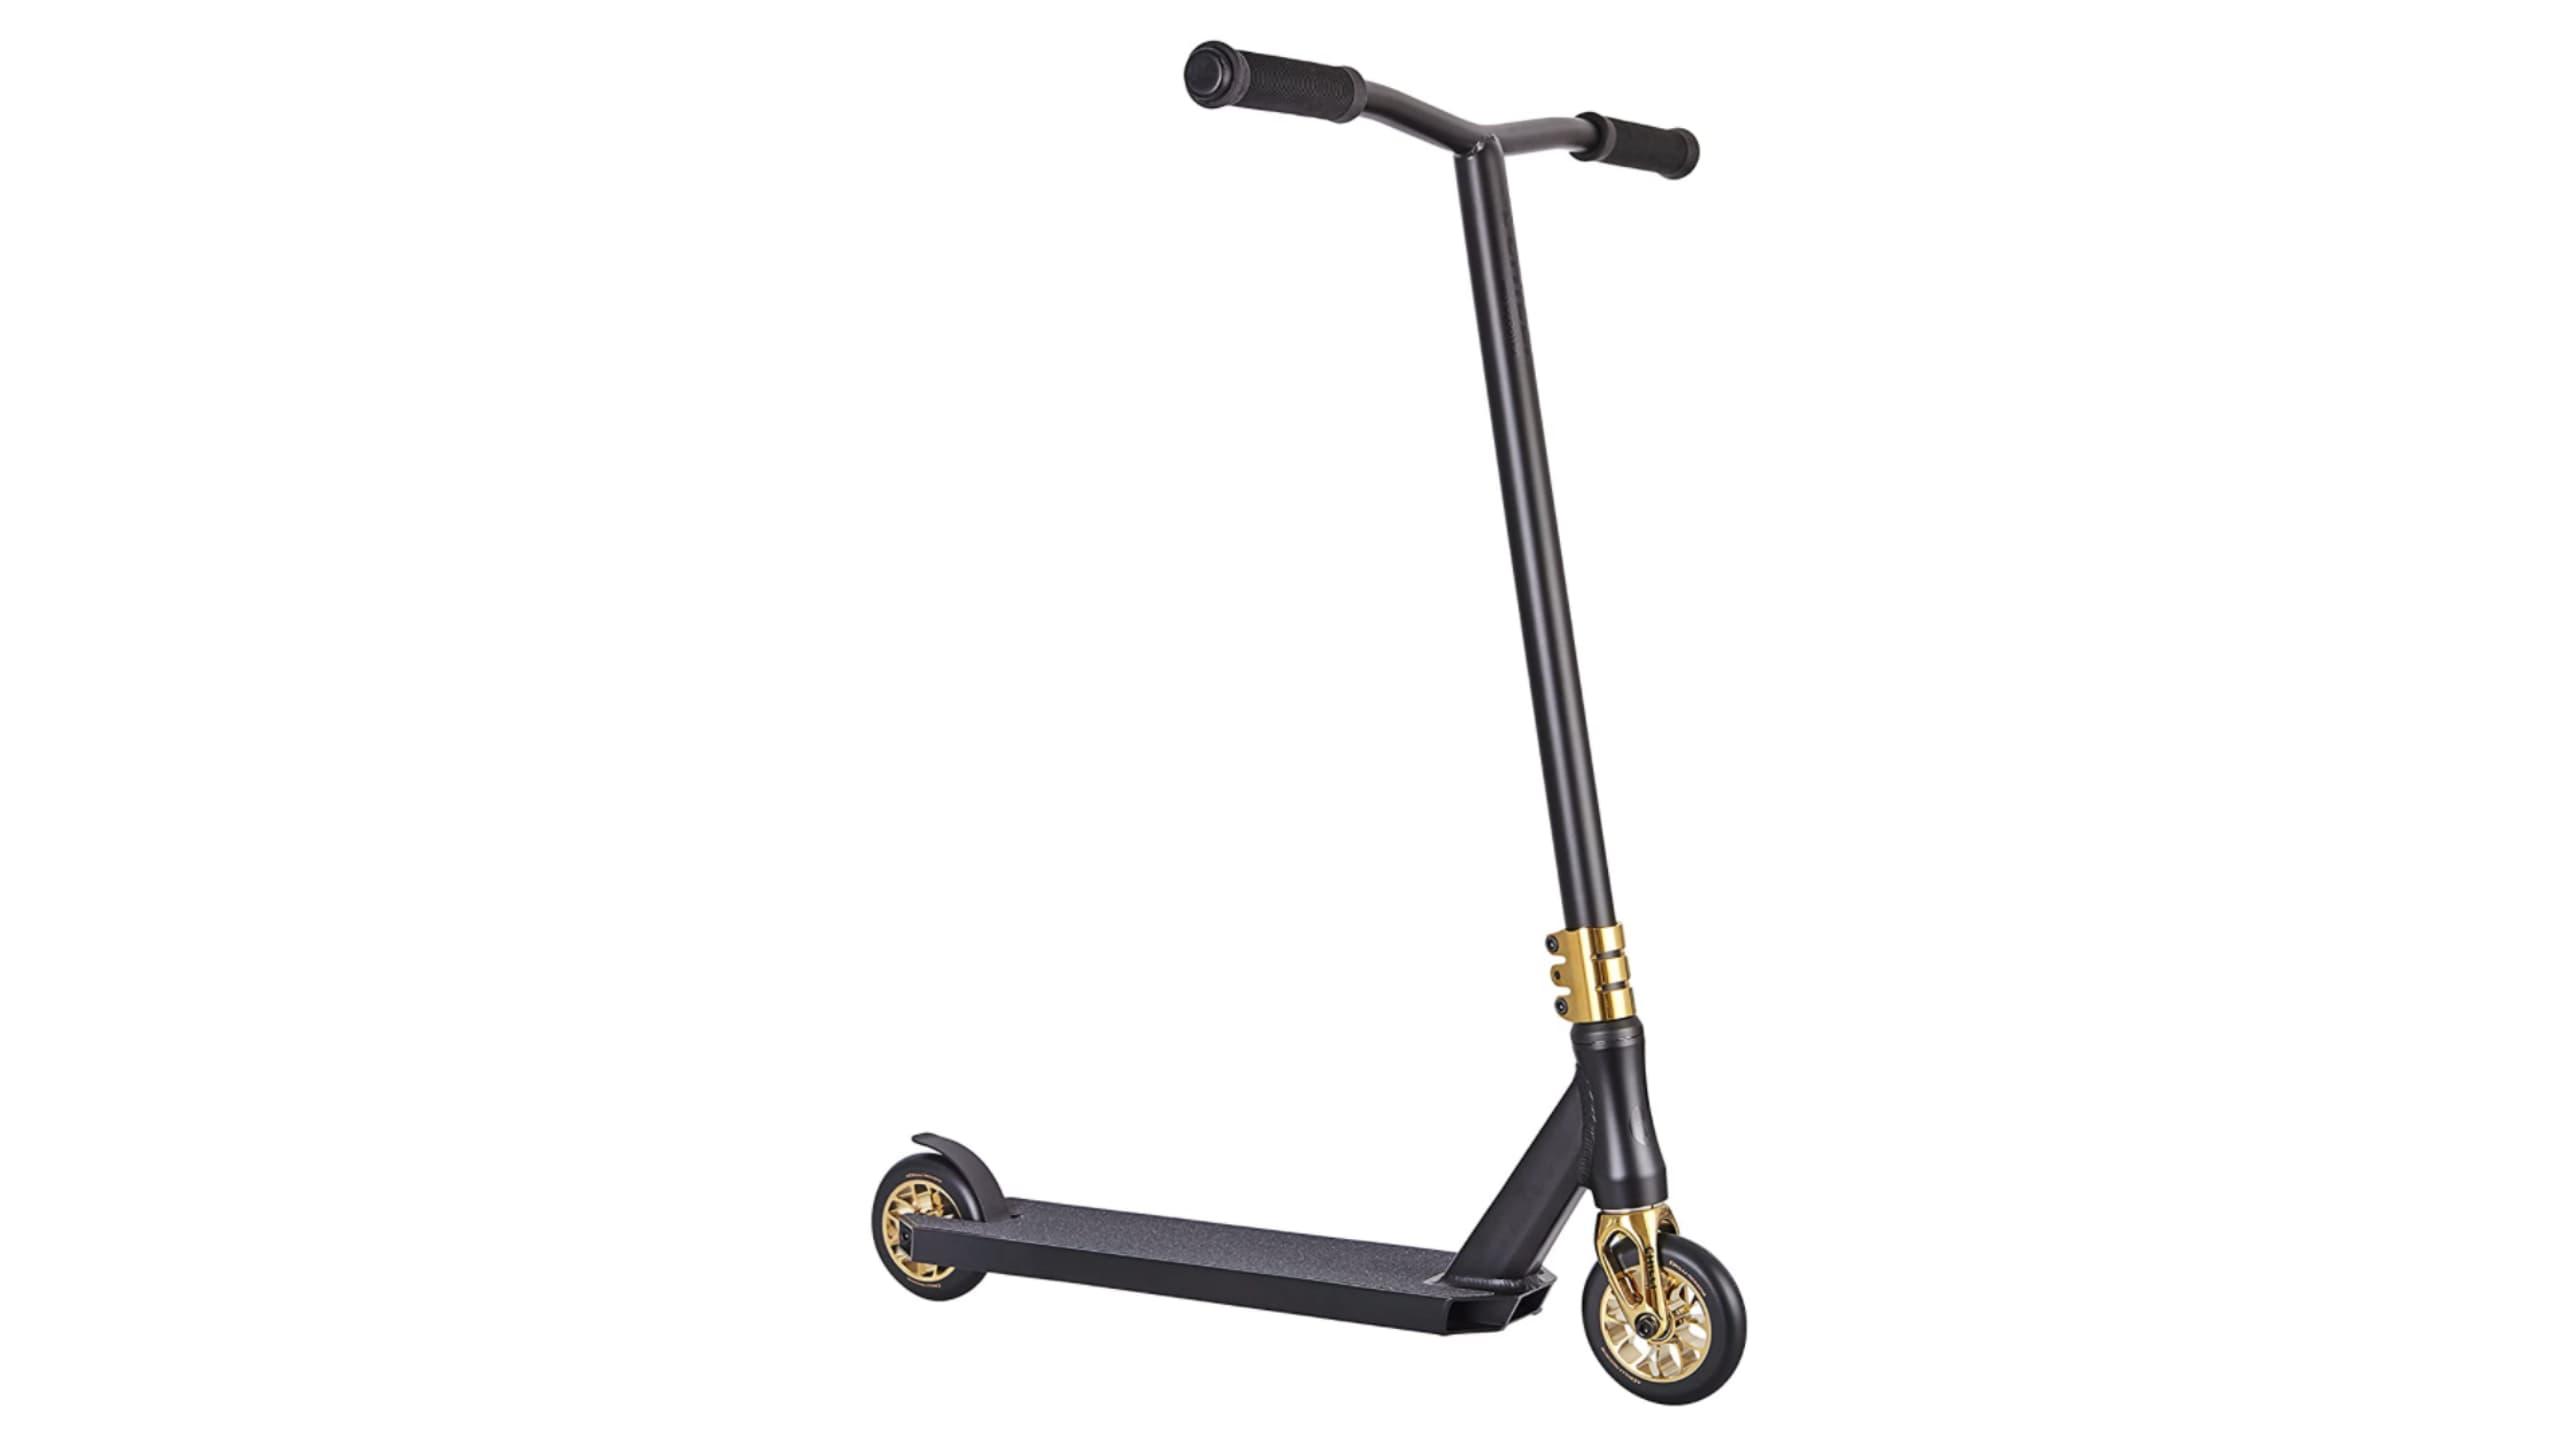 die besten profi stunt scooter